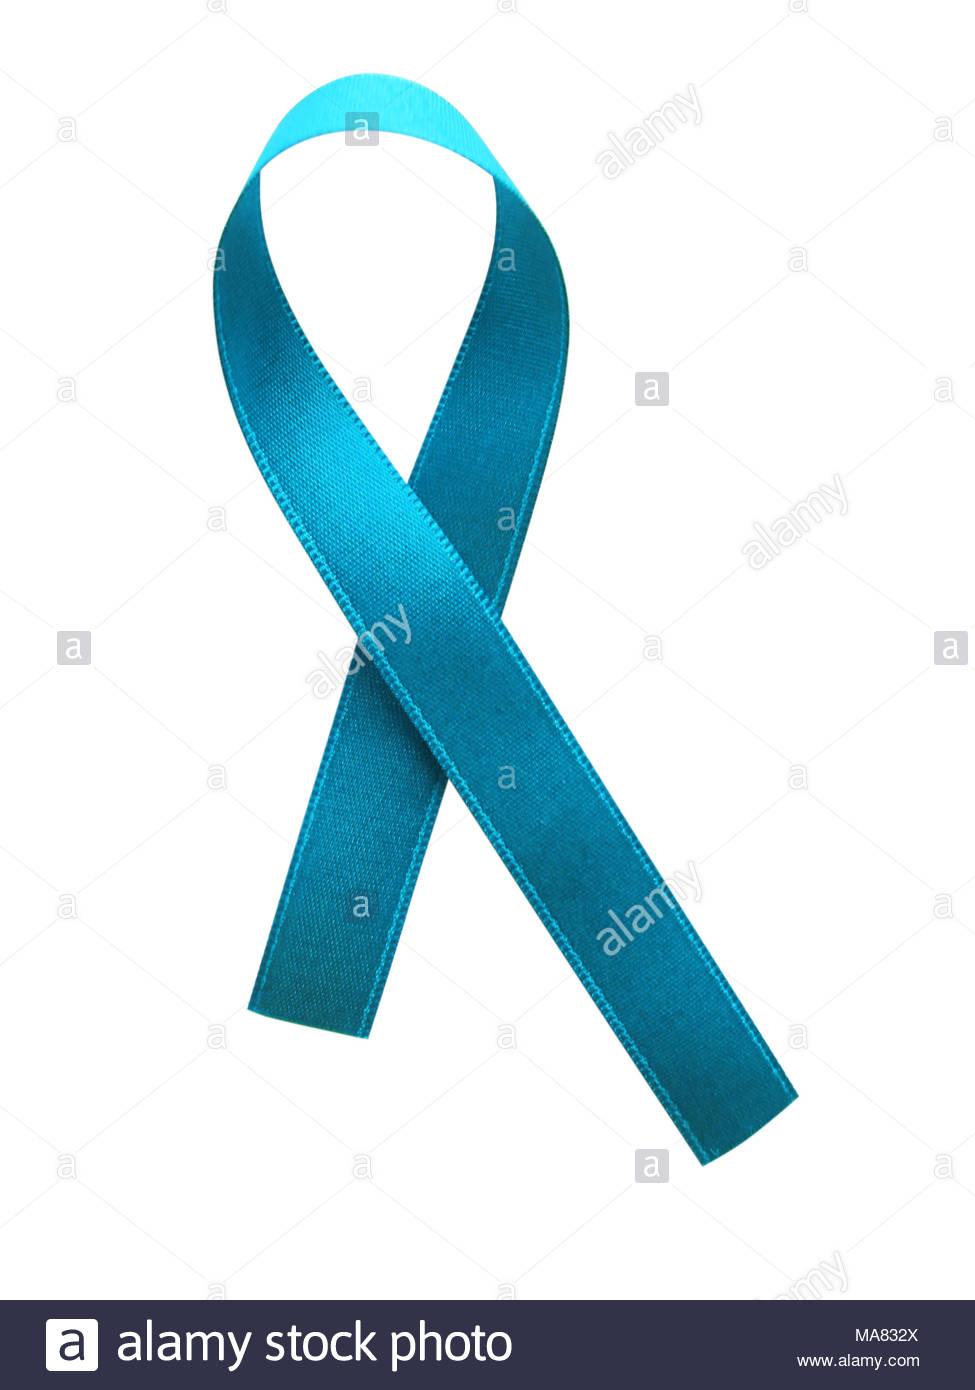 975x1390 Prostate Cancer Ribbon Awareness. Disease Symbol. Light Blue